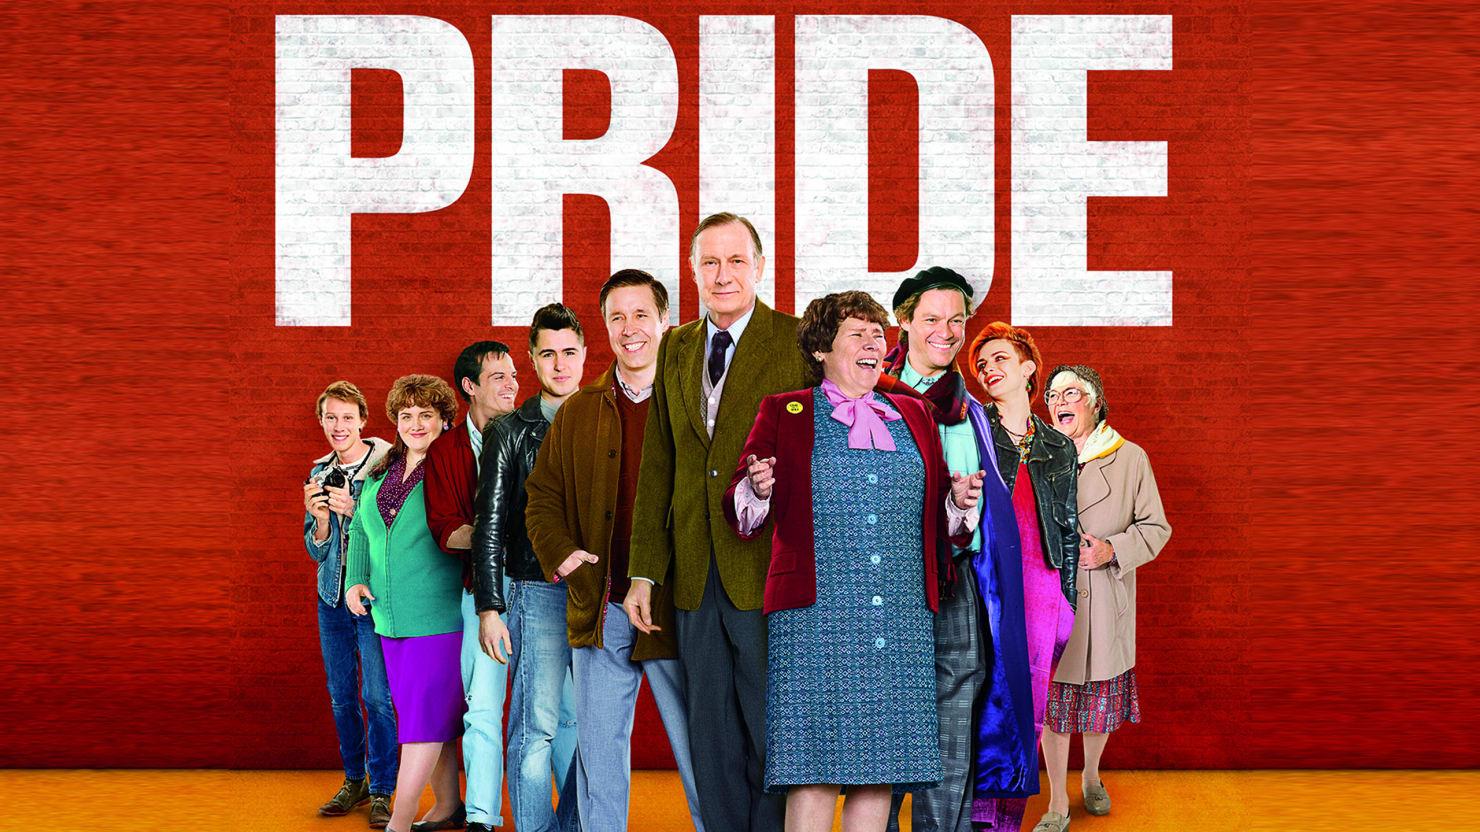 pride film - photo #6